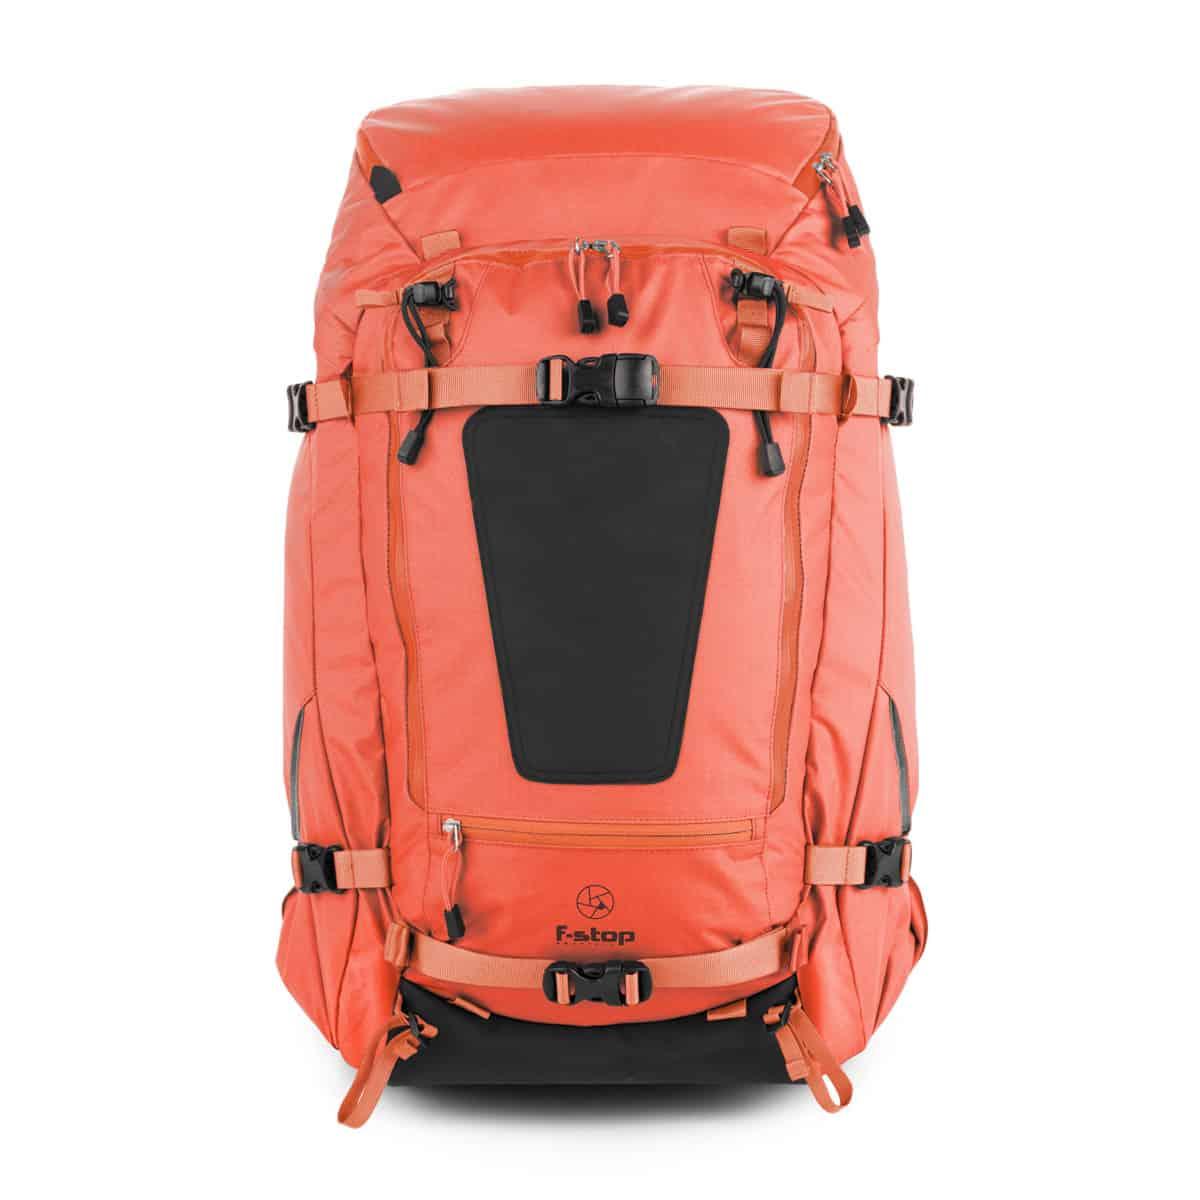 Mindshift Backlight 36L review Fstop Shinn Orange Front White Background